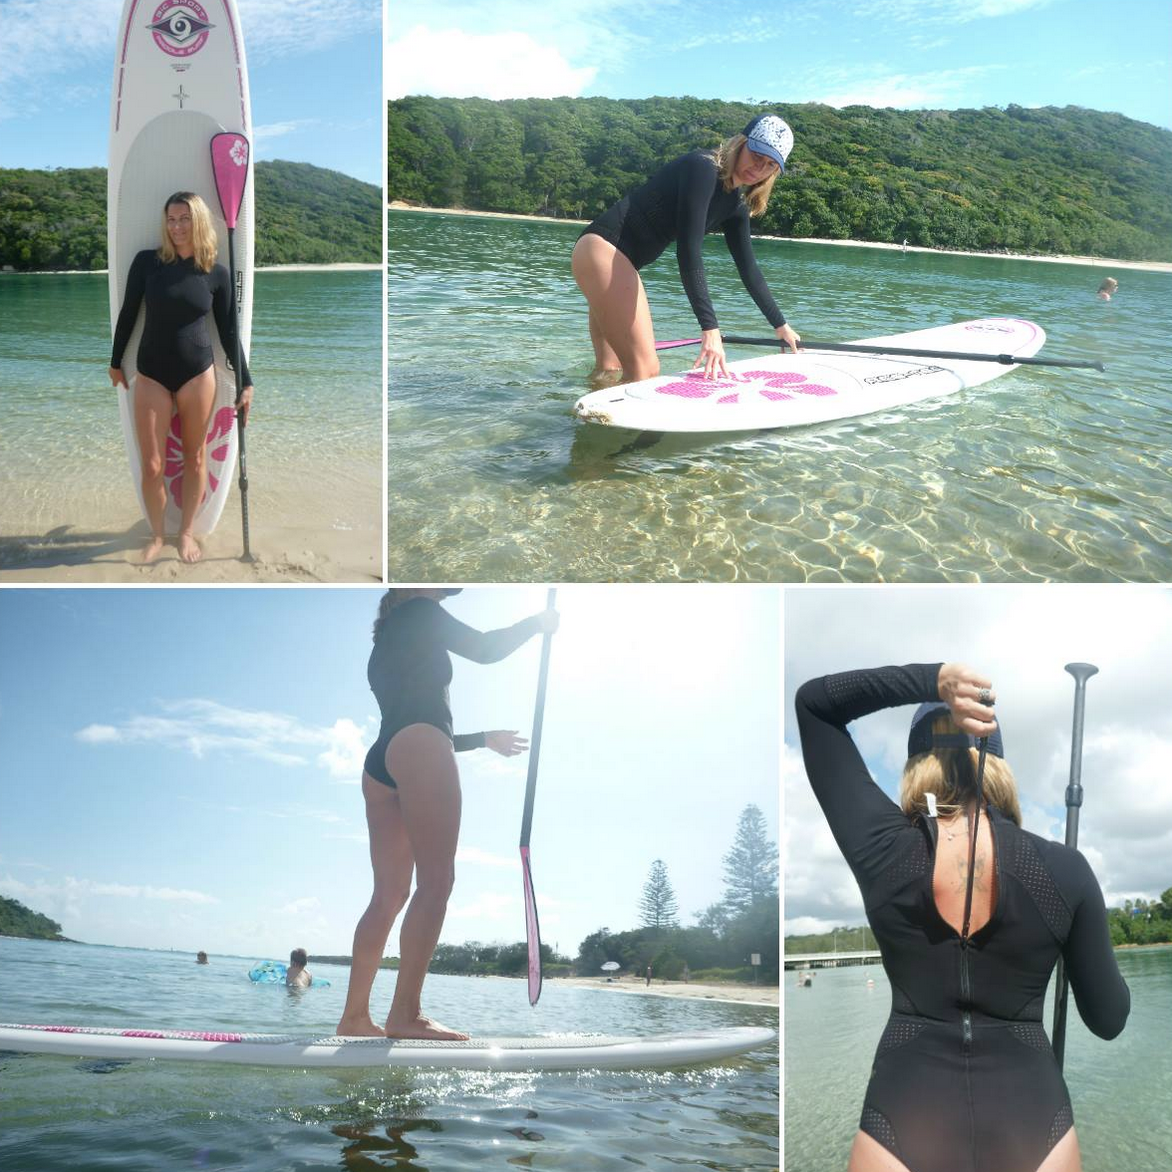 http://www.anrdoezrs.net/links/7680158/type/dlg/http://shop.lululemon.com/products/category/womens-swim?mnid=mn;USwomen;activities;swim